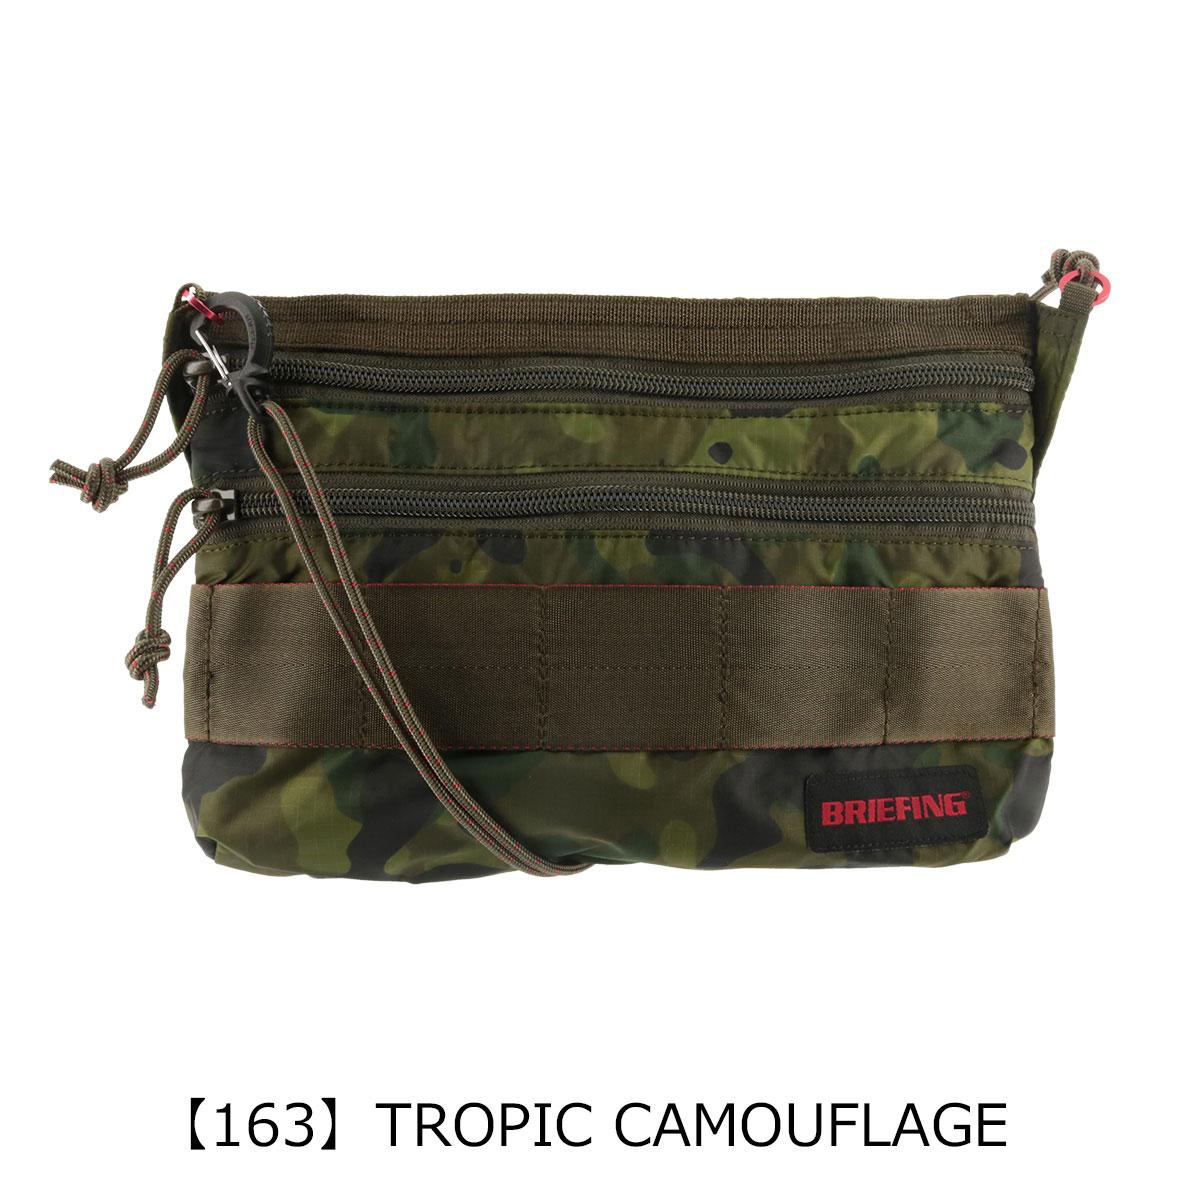 【163】TROPIC CAMOUFLAGE